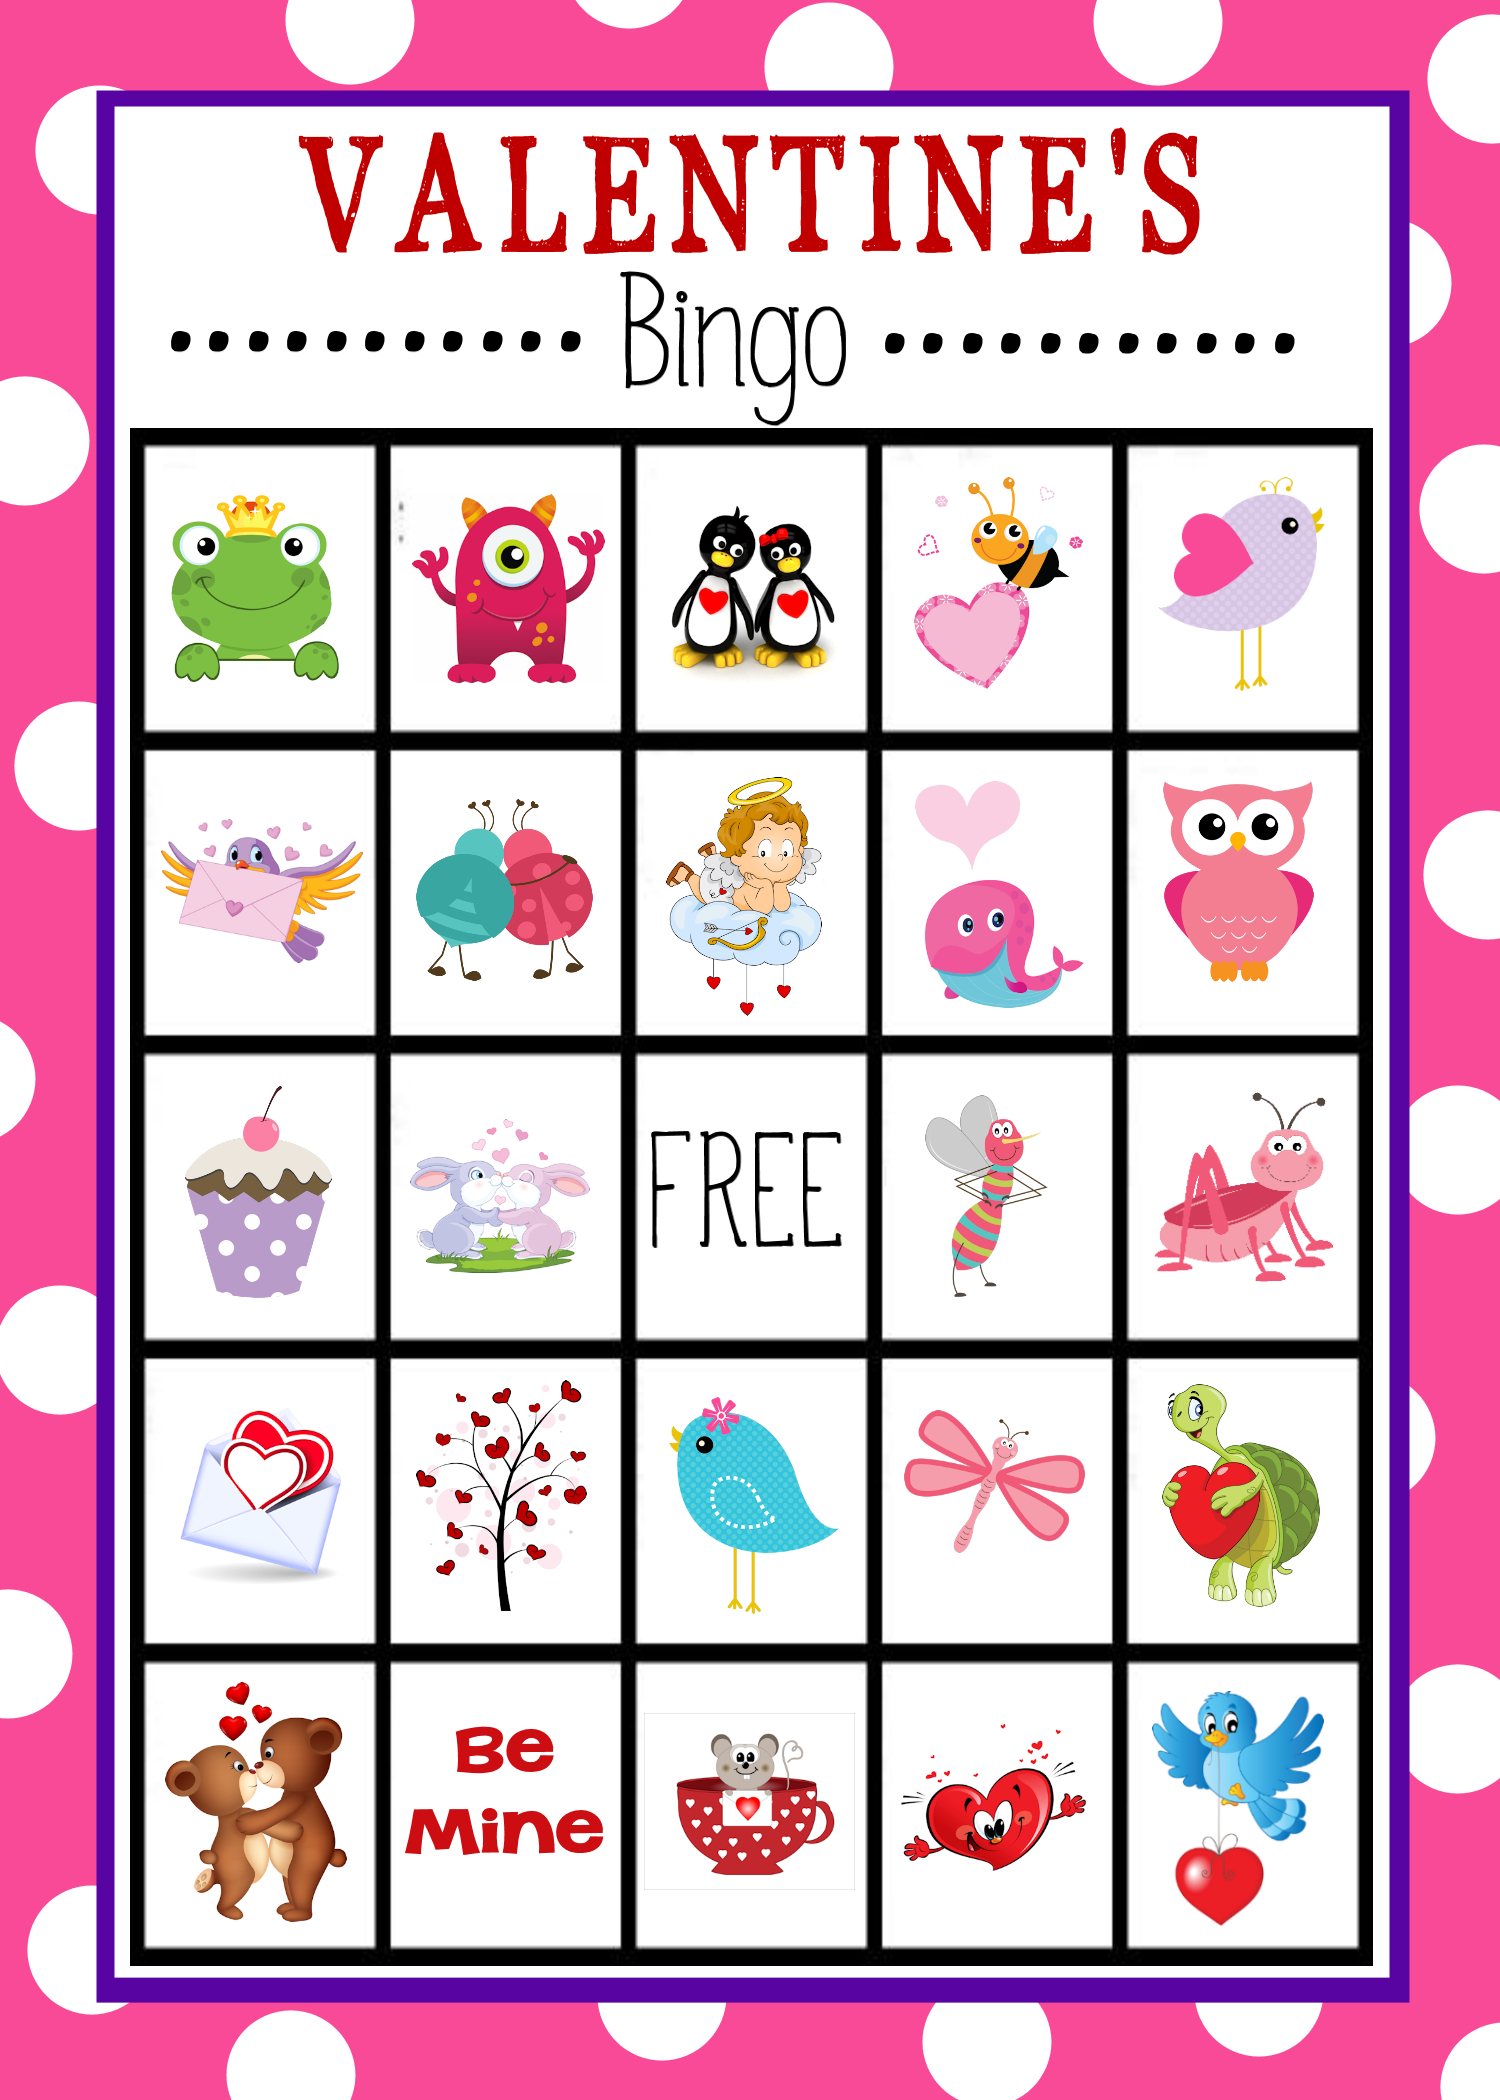 Valentine's Bingo Game To Print & Play | Valentine's Day Activities - Valentine Bingo Game Printable Free